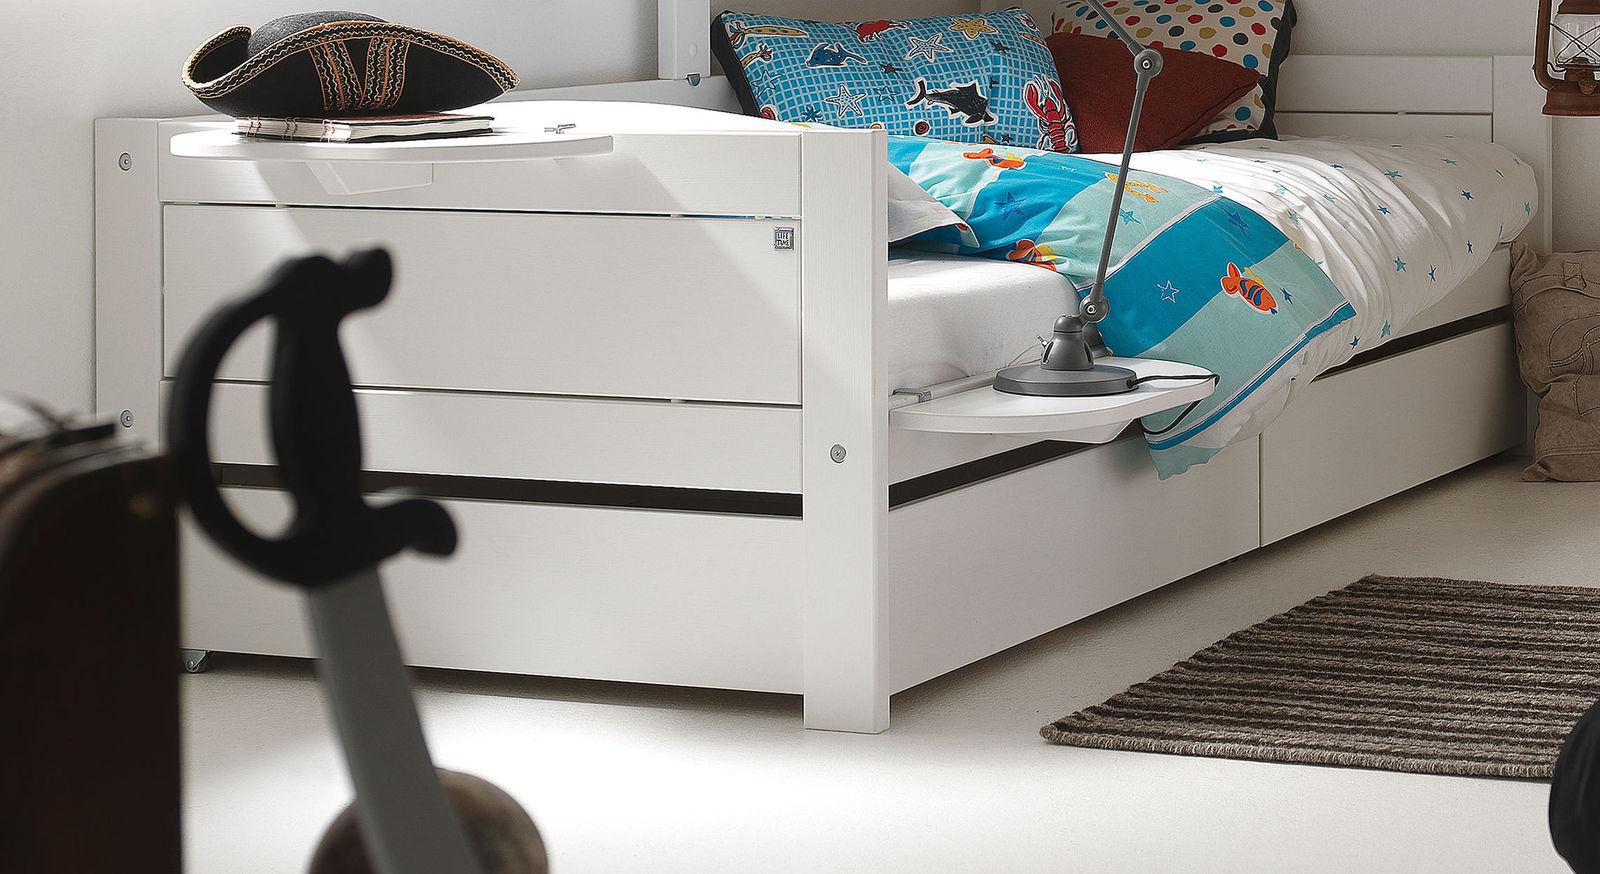 LIFETIME Bettschubkästen Original als praktischer Stauraum unterm Bett